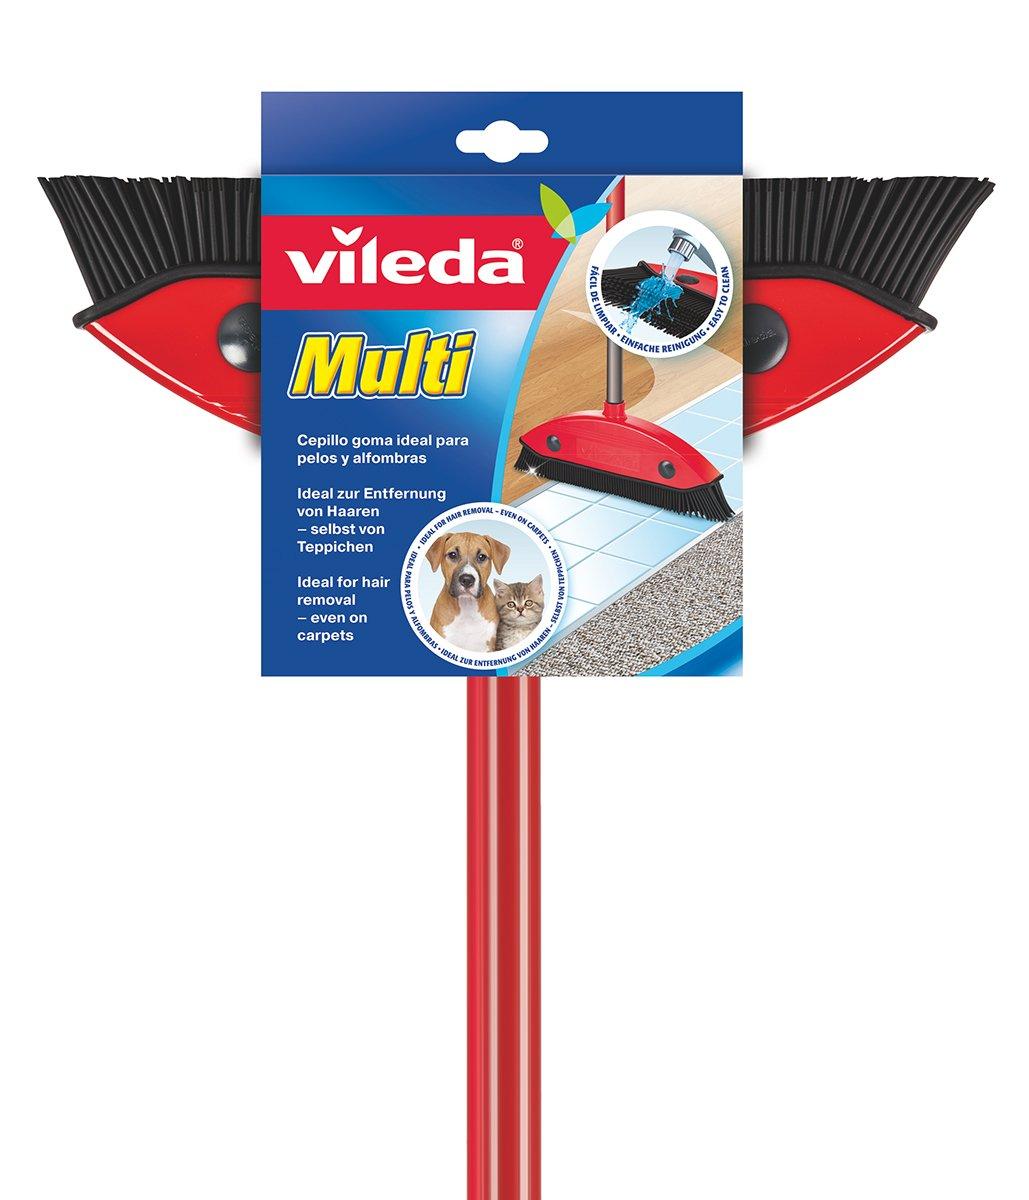 Vileda 142677 Multi Broom with Telescopic Handle by Vileda (Image #1)